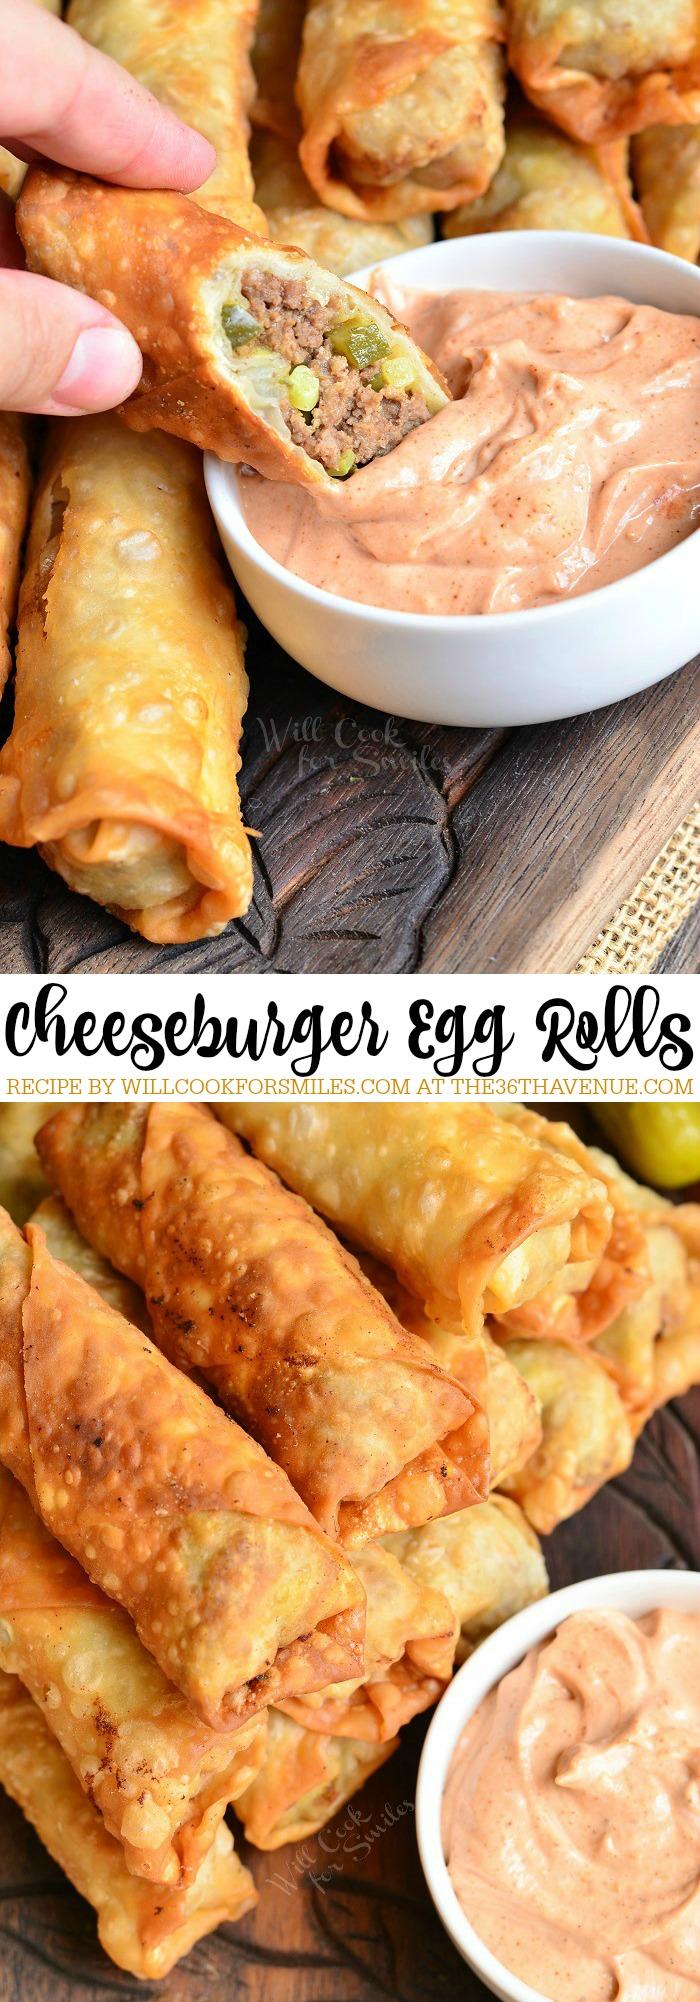 Crockpot Express Egg Recipes